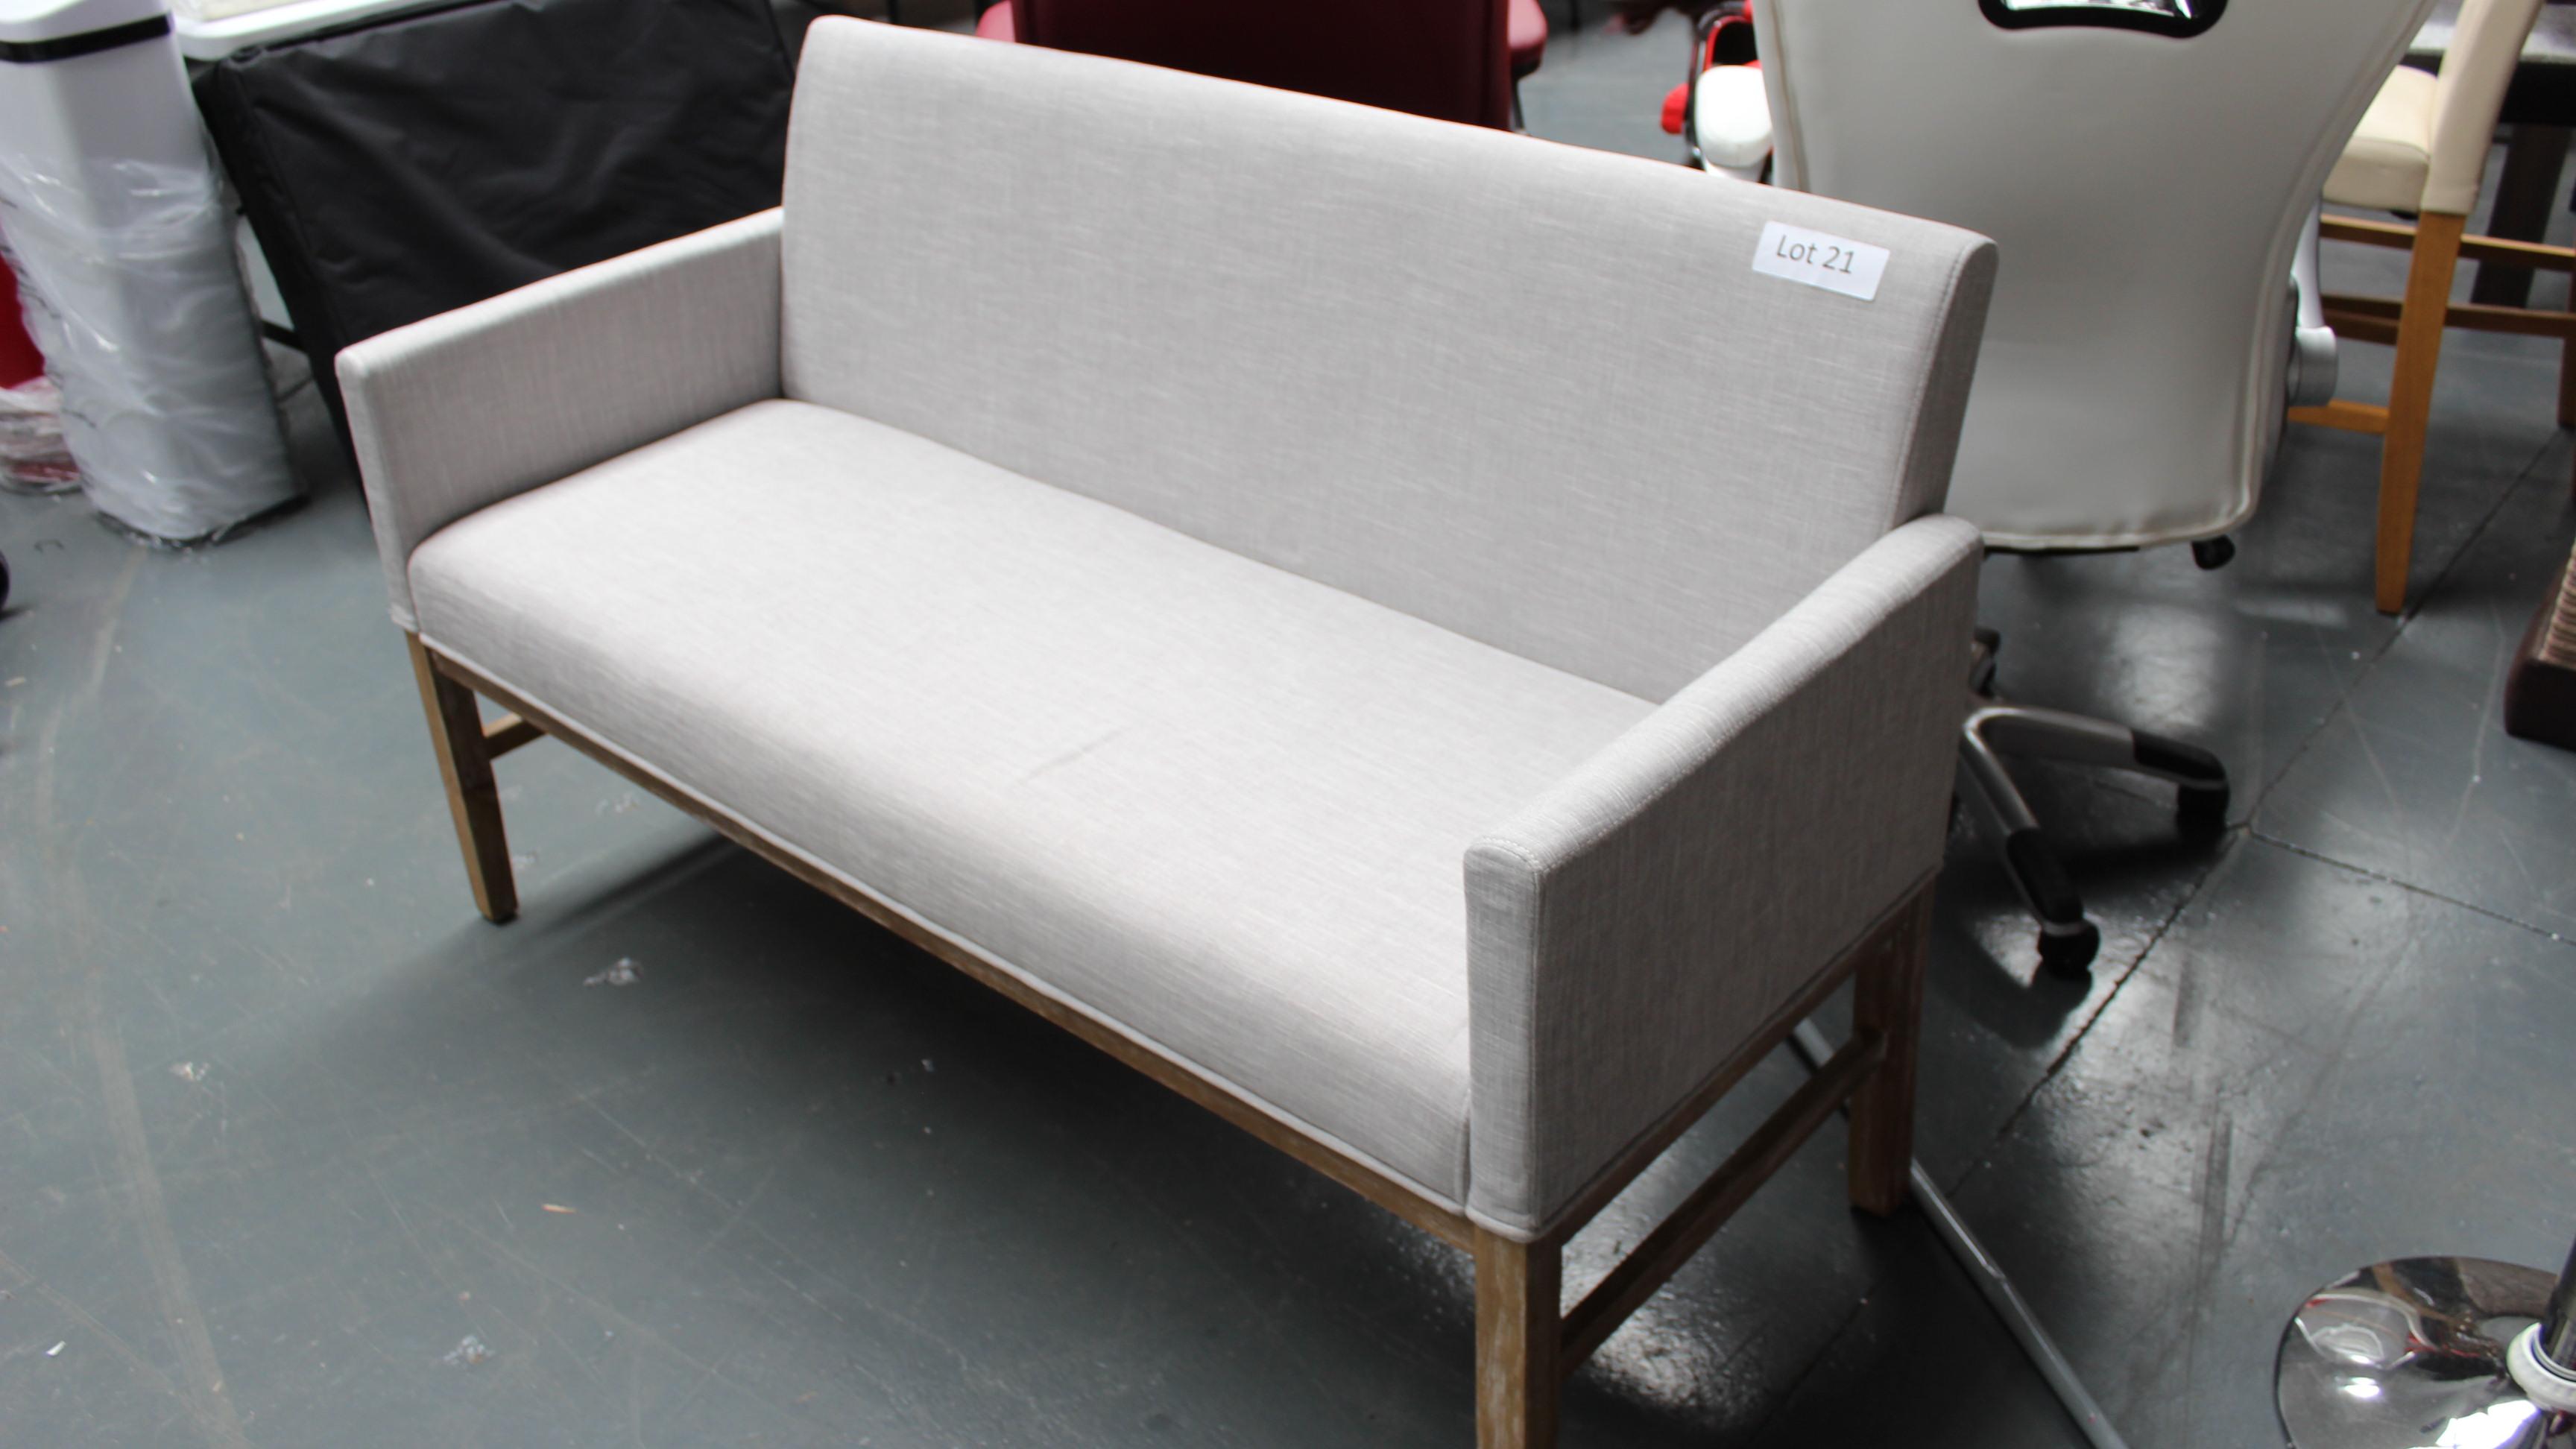 Lot 21 - Light Gray & Wood Sofa. New